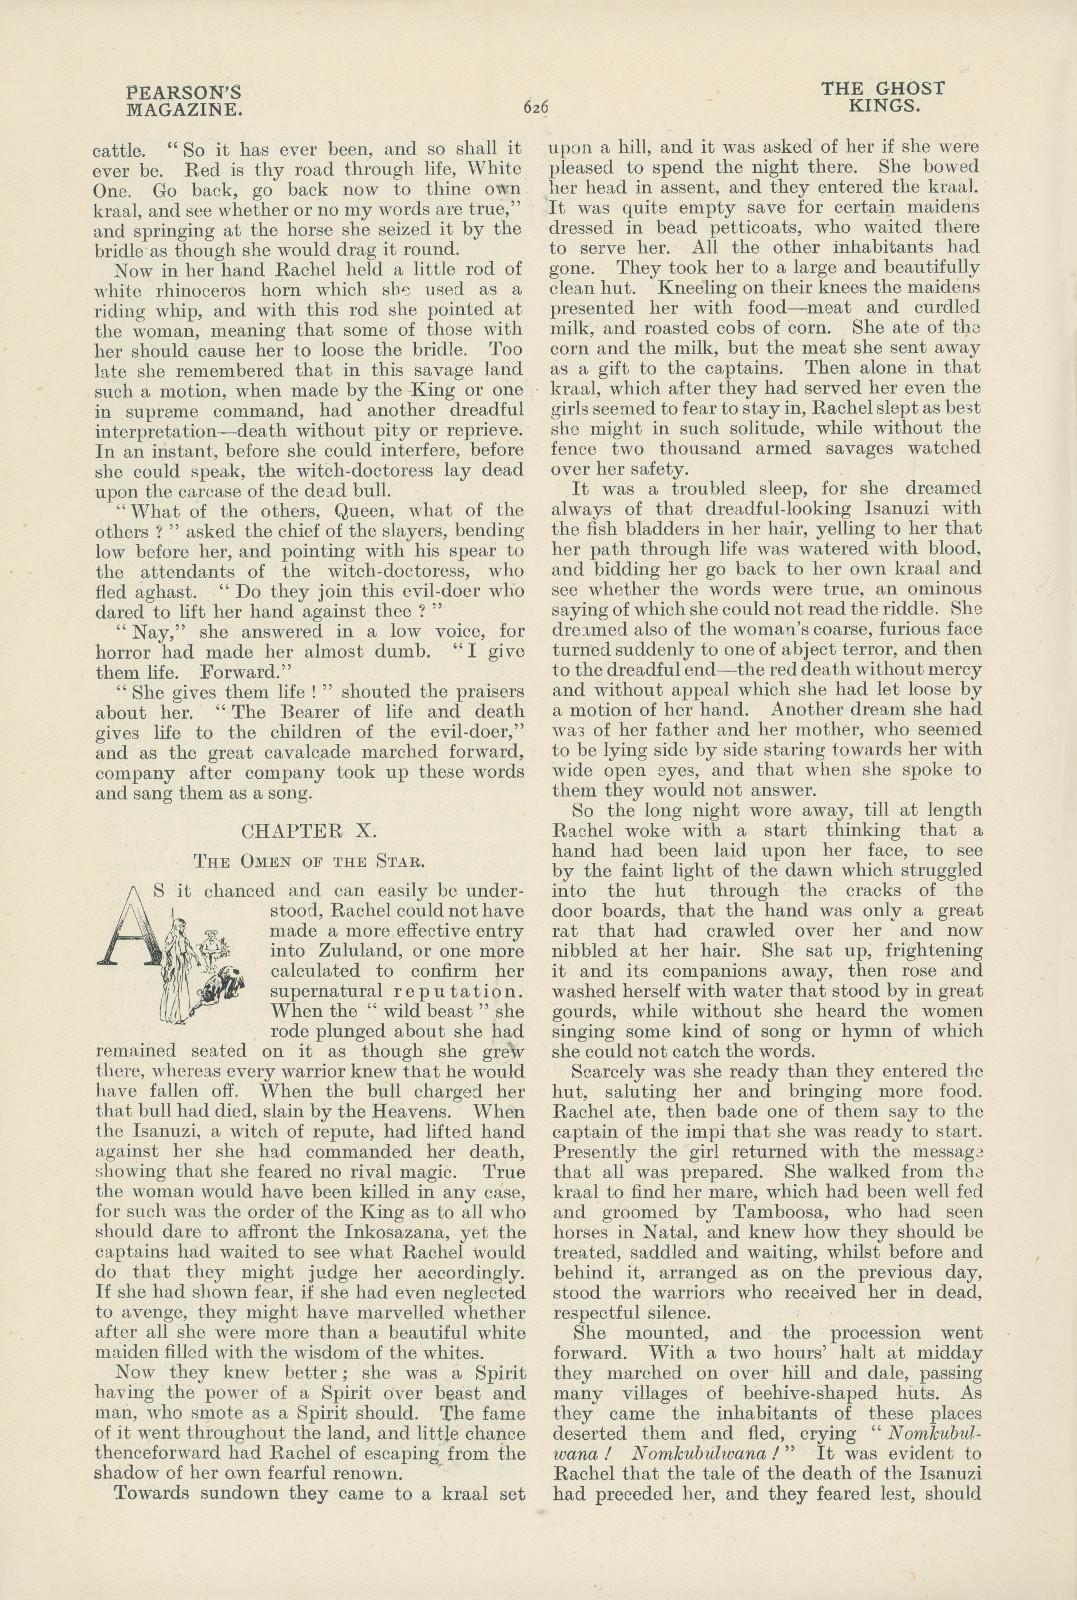 Aspearsonsmagazine626